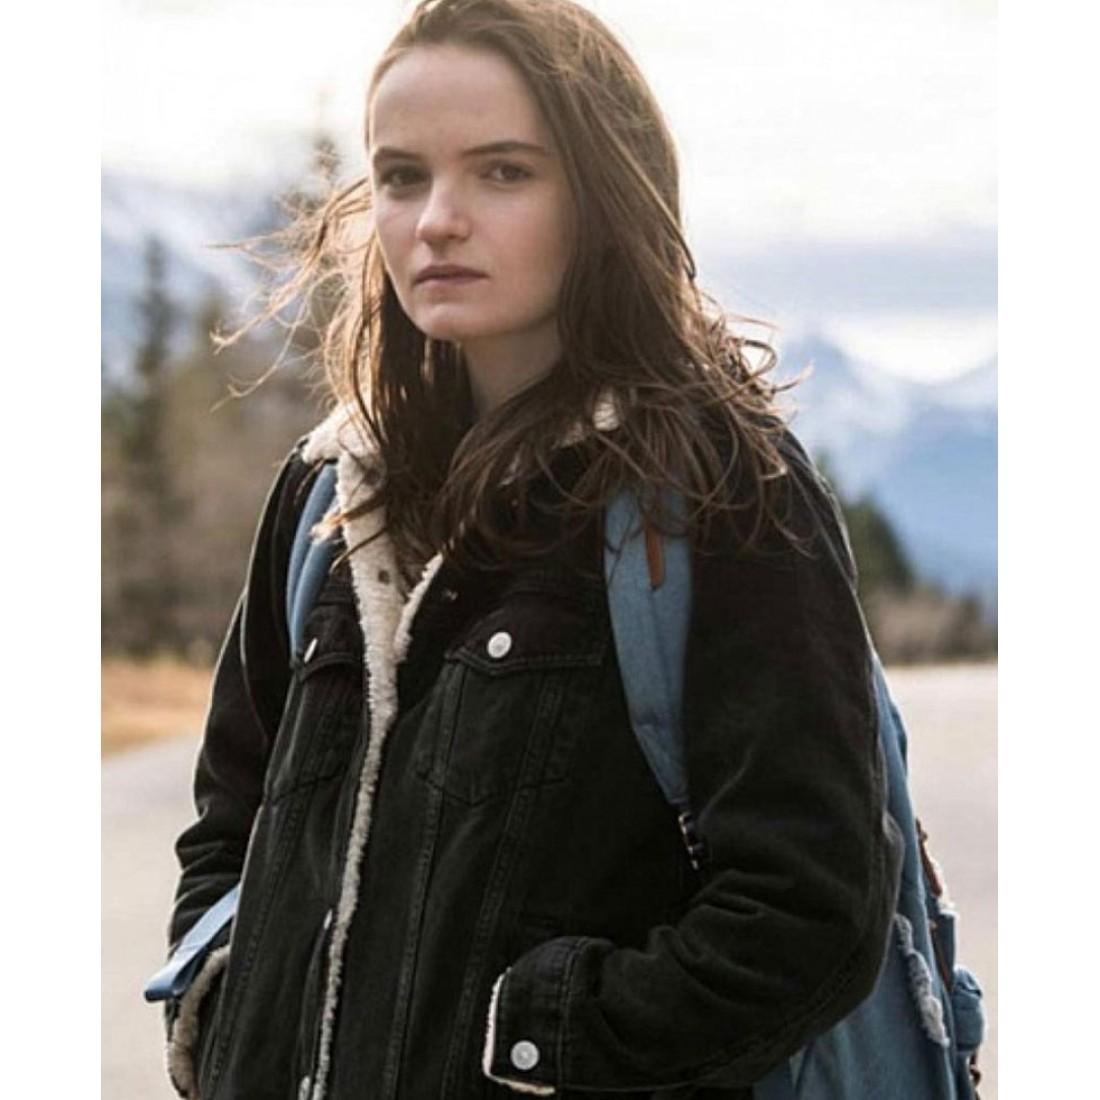 Anna Worth Jacket | Tin Star Abigail Lawrie Denim Jacket - Films Jackets